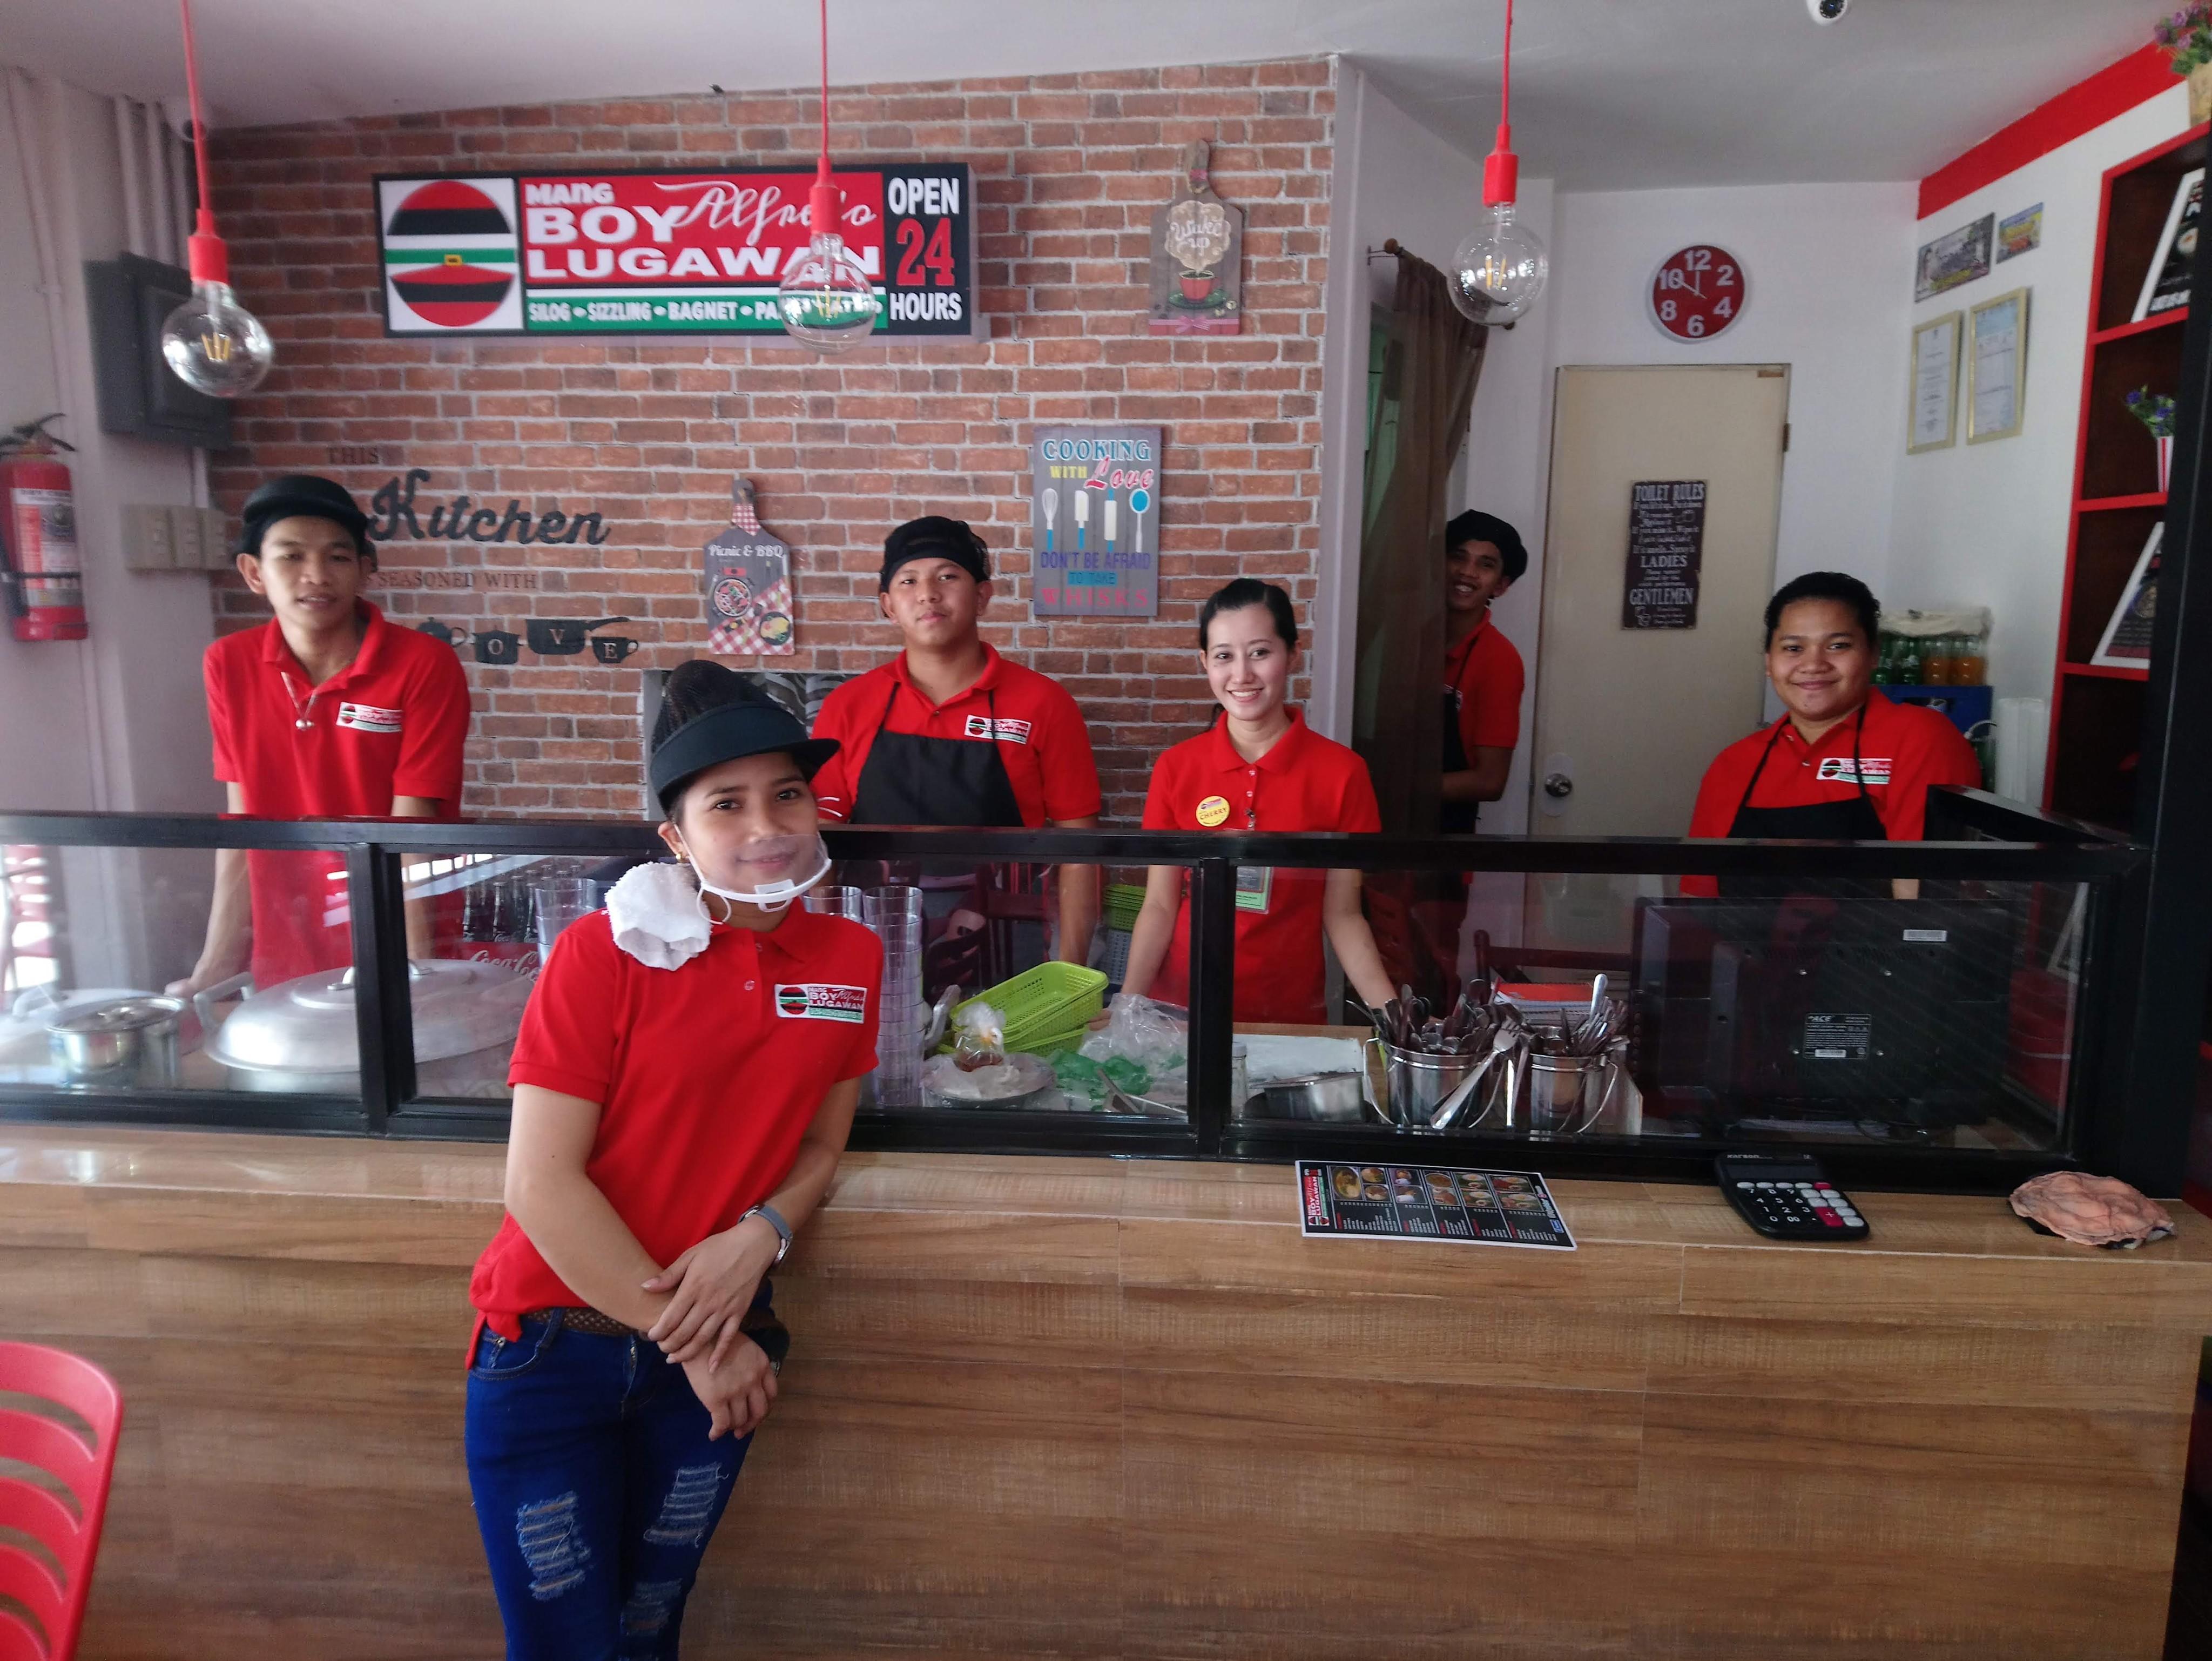 mang-boy-alfredo-lugawan-staffs